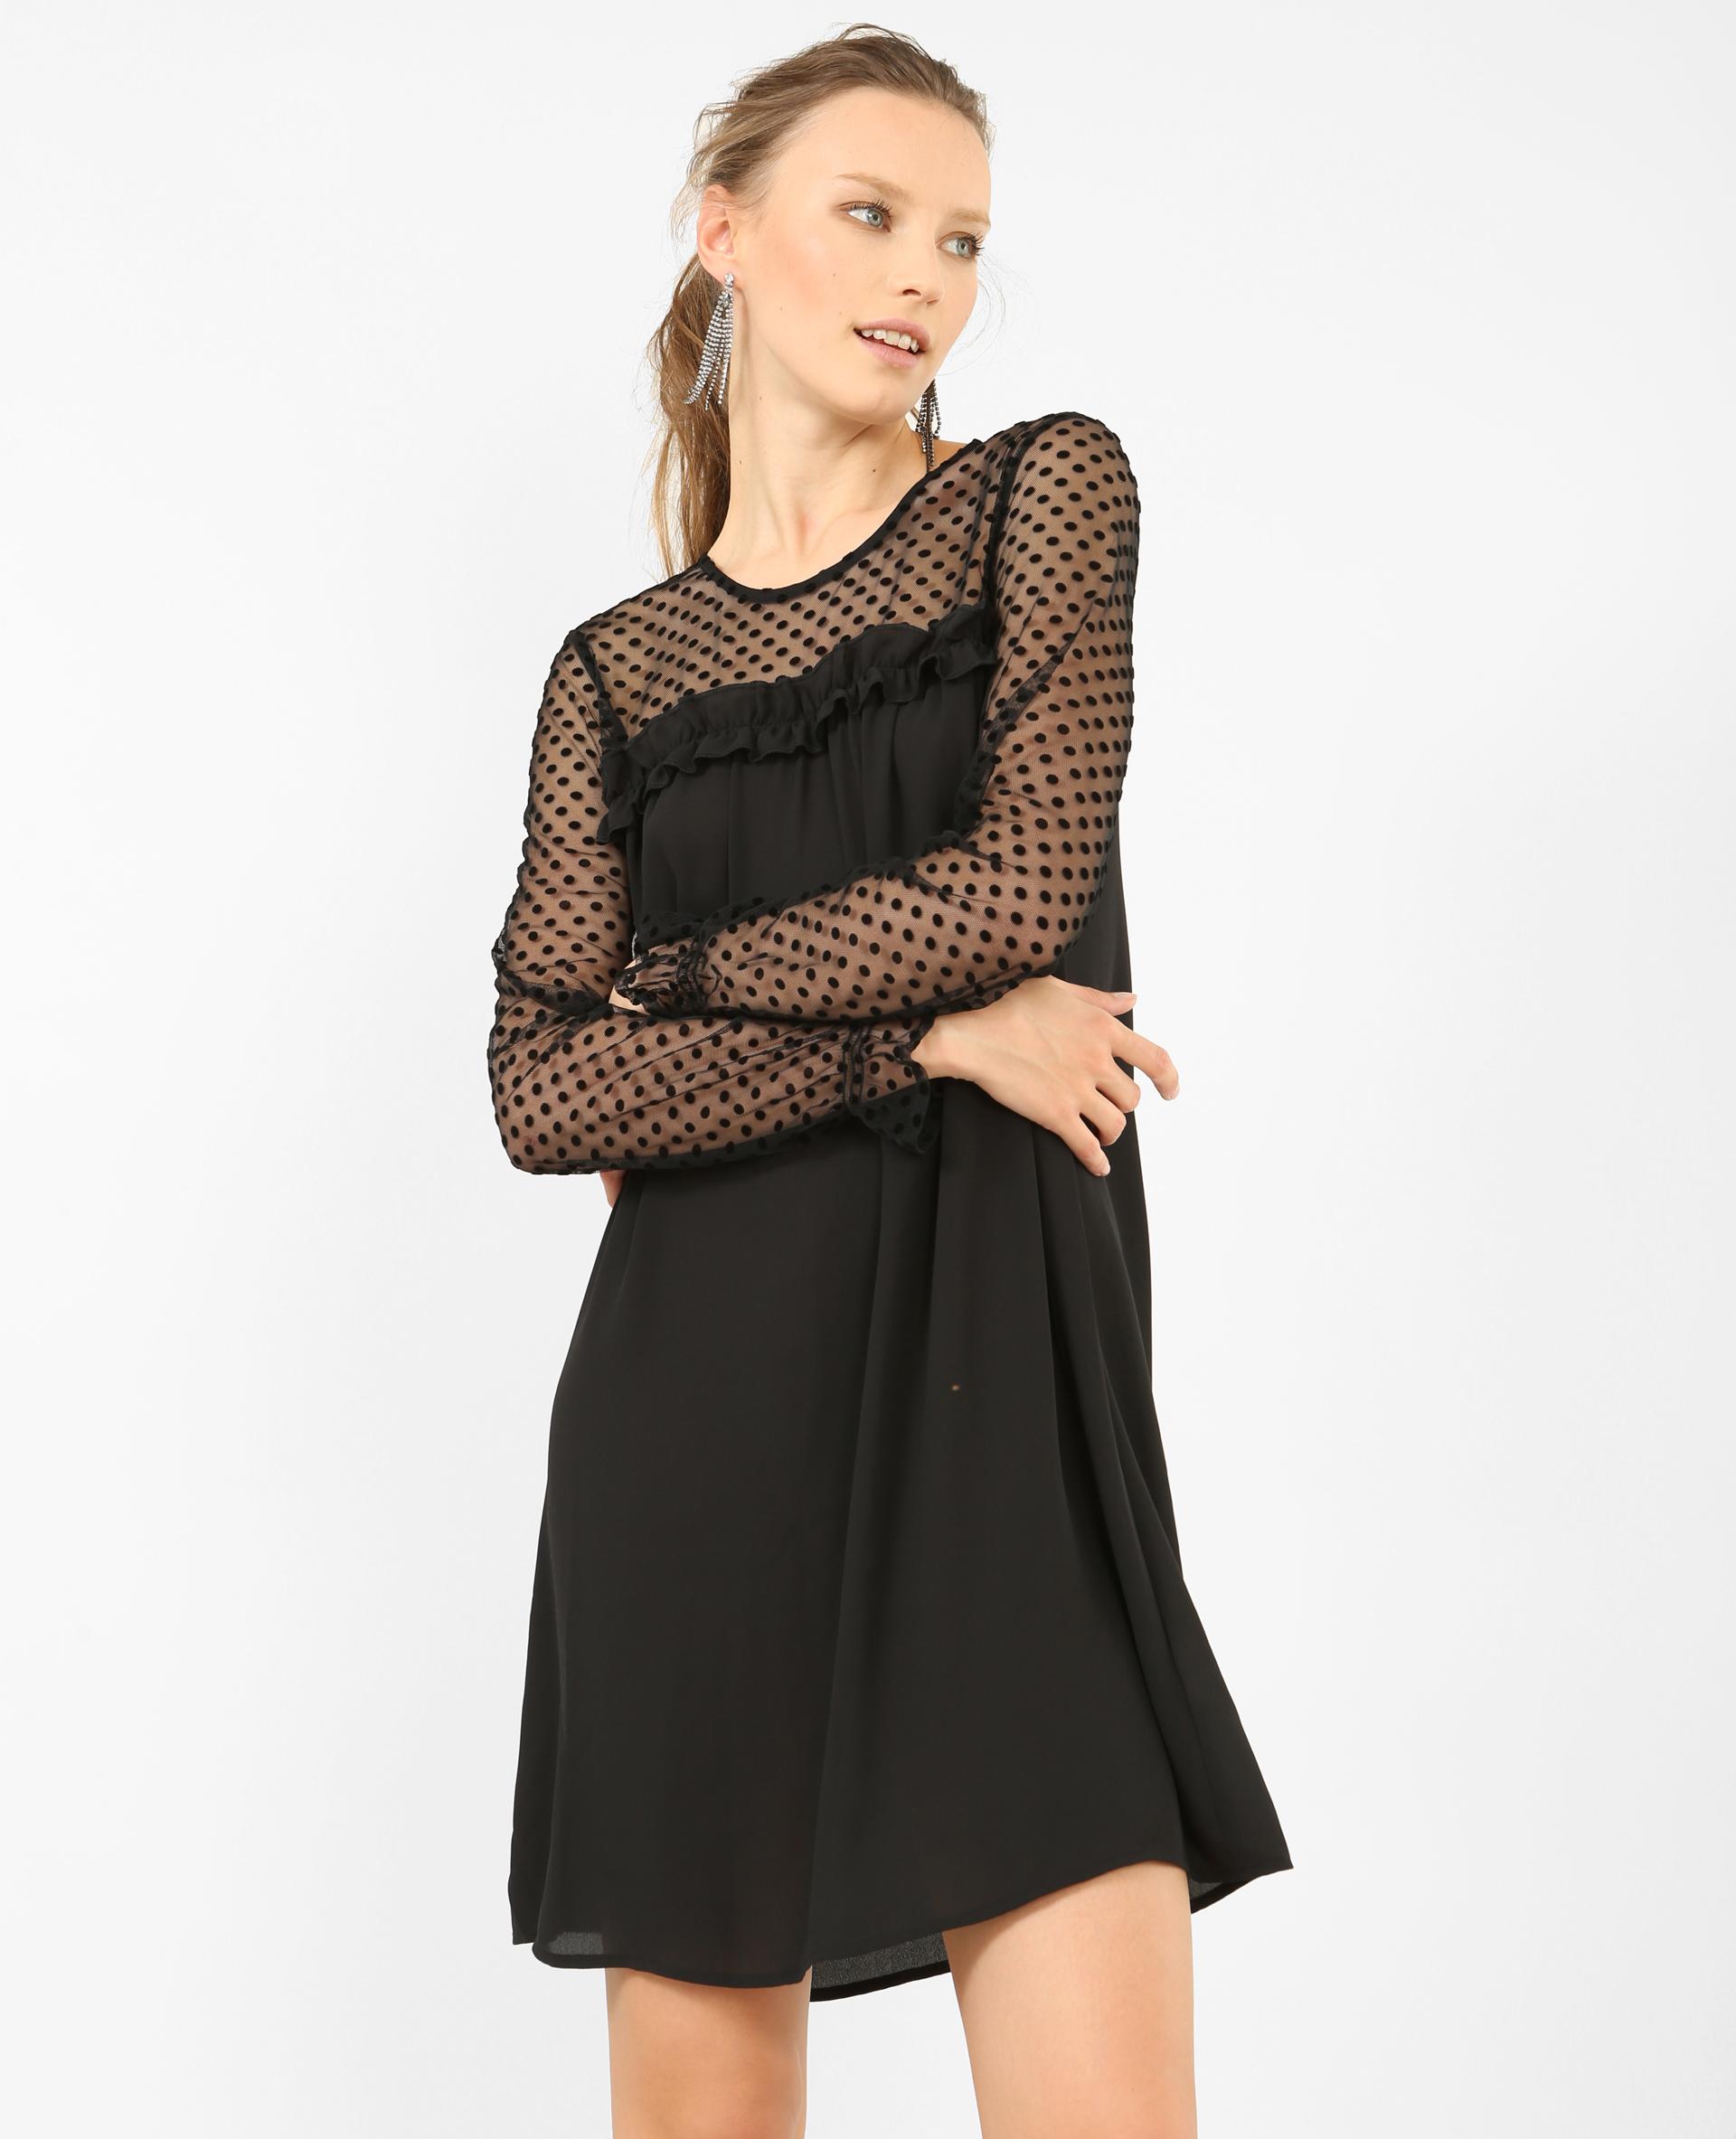 robe en plumetis noir 780823899a08 pimkie. Black Bedroom Furniture Sets. Home Design Ideas